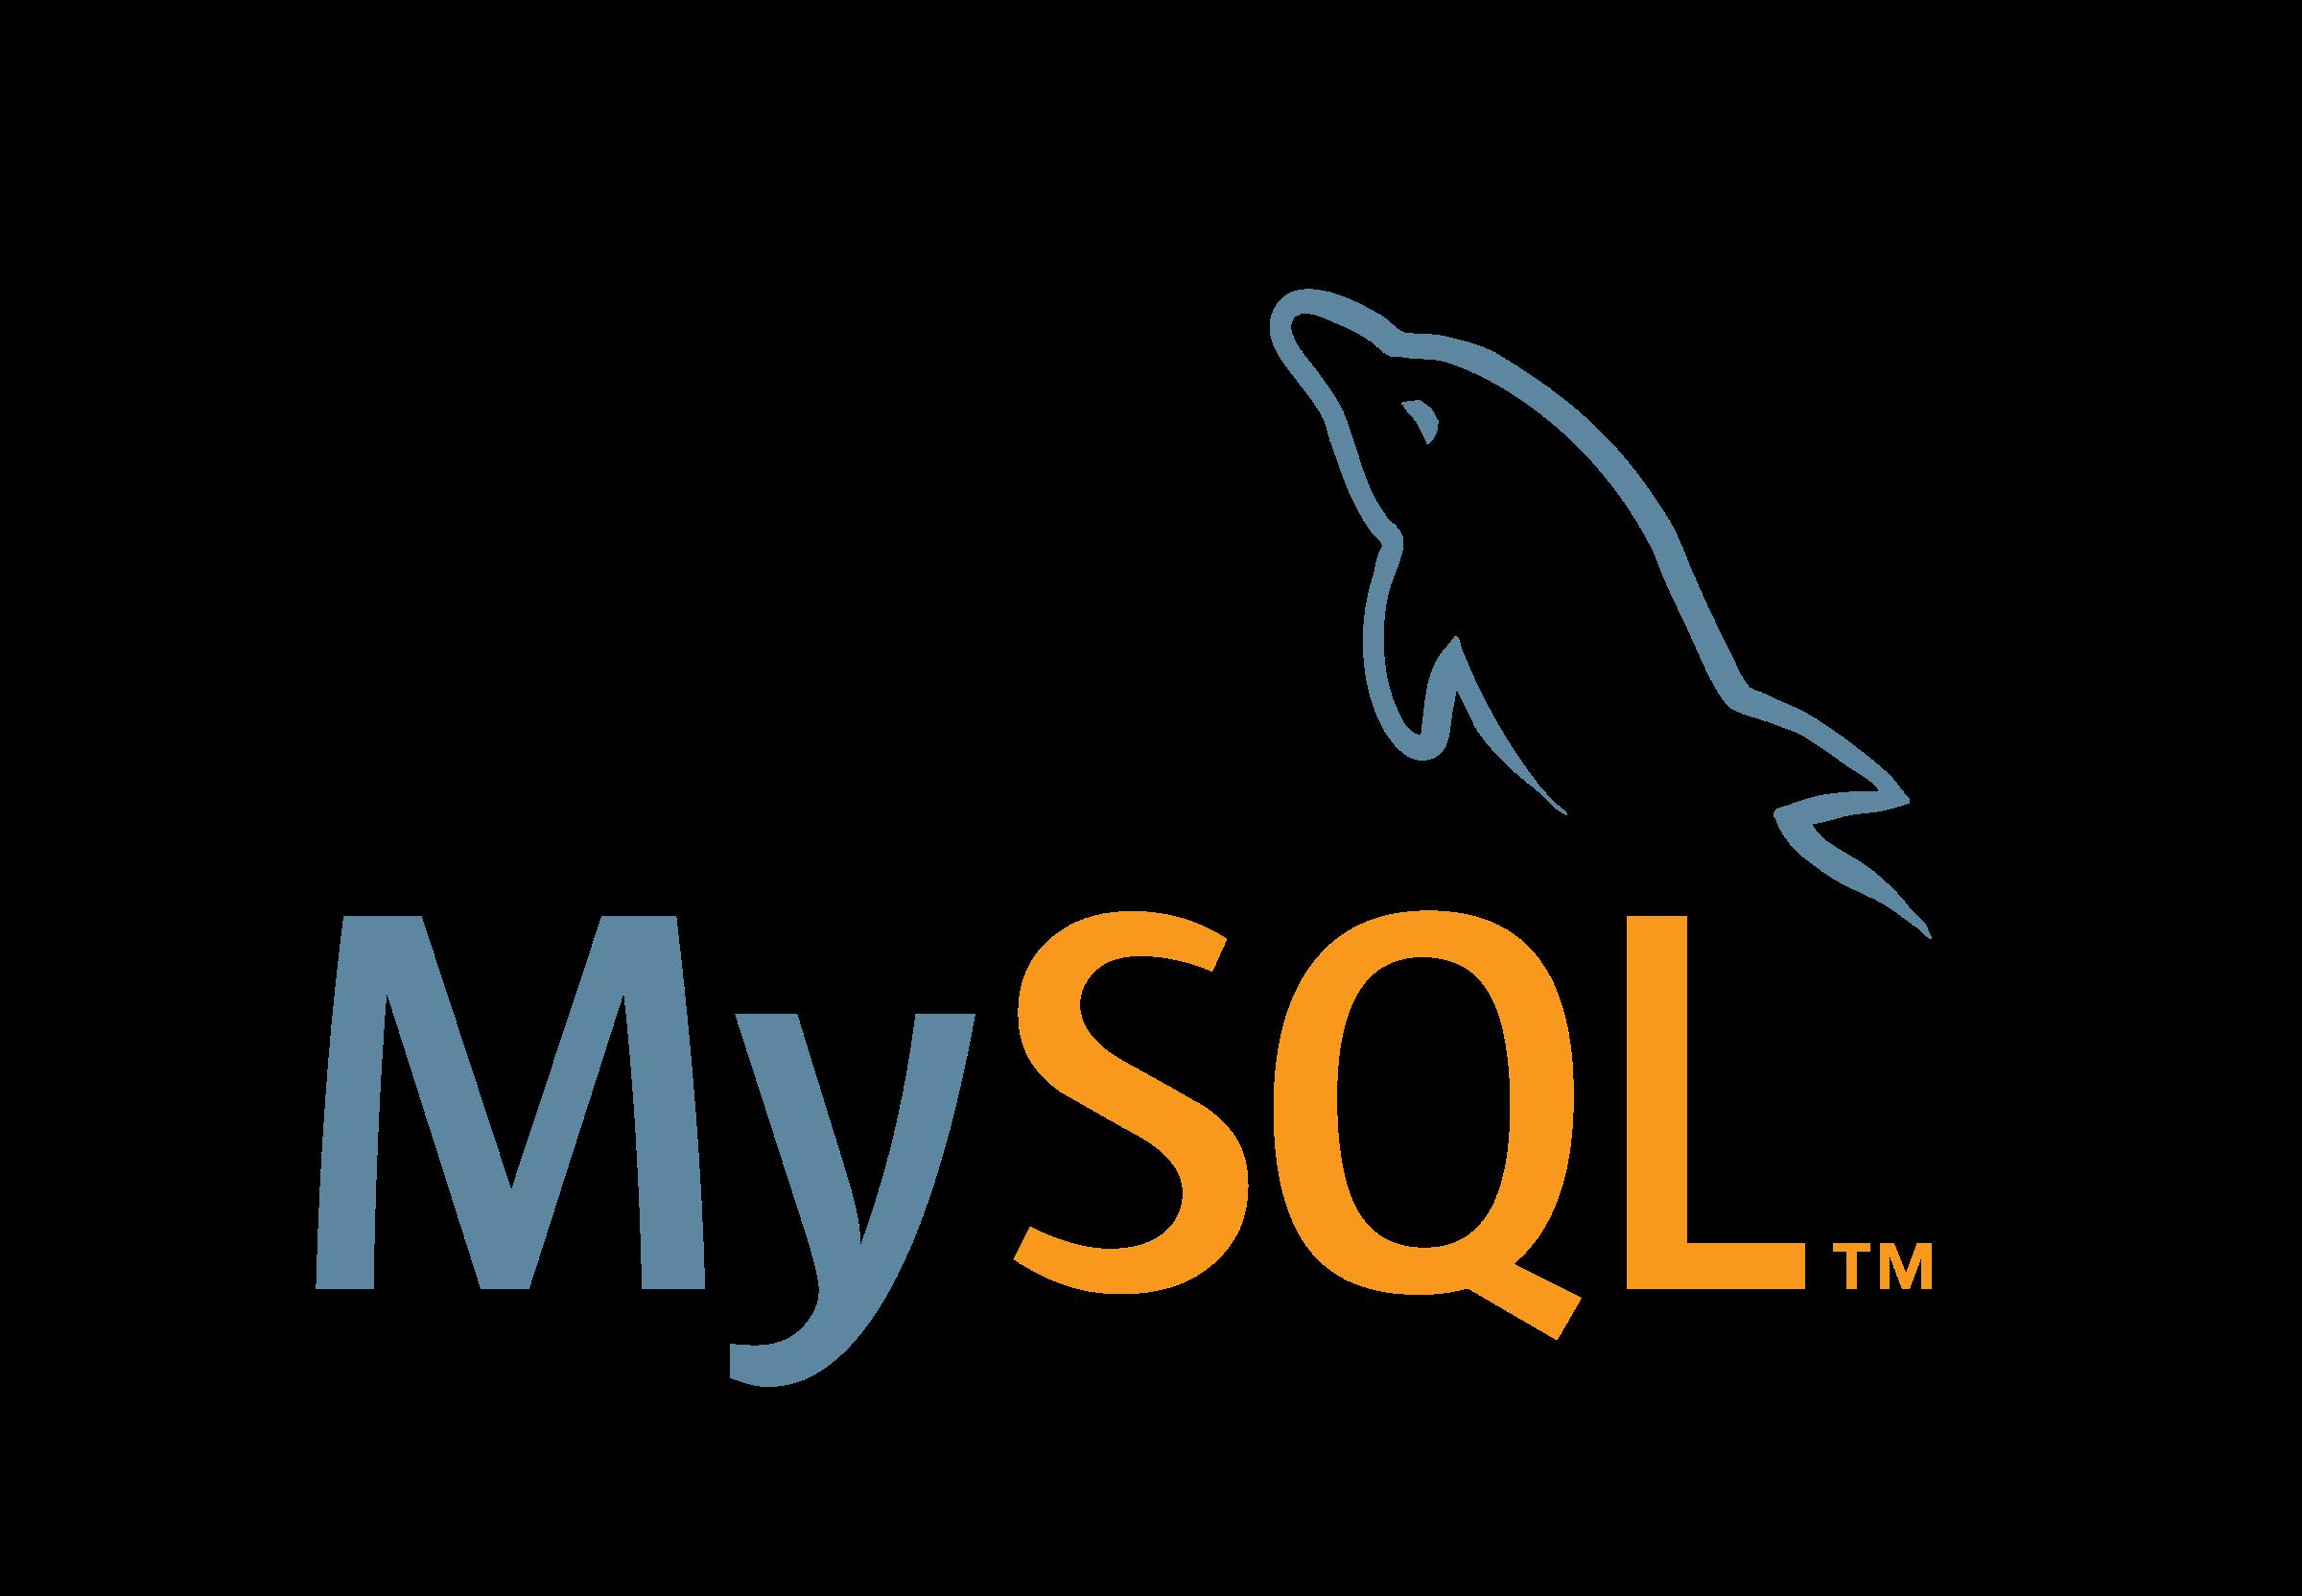 MySQL логотип PNG